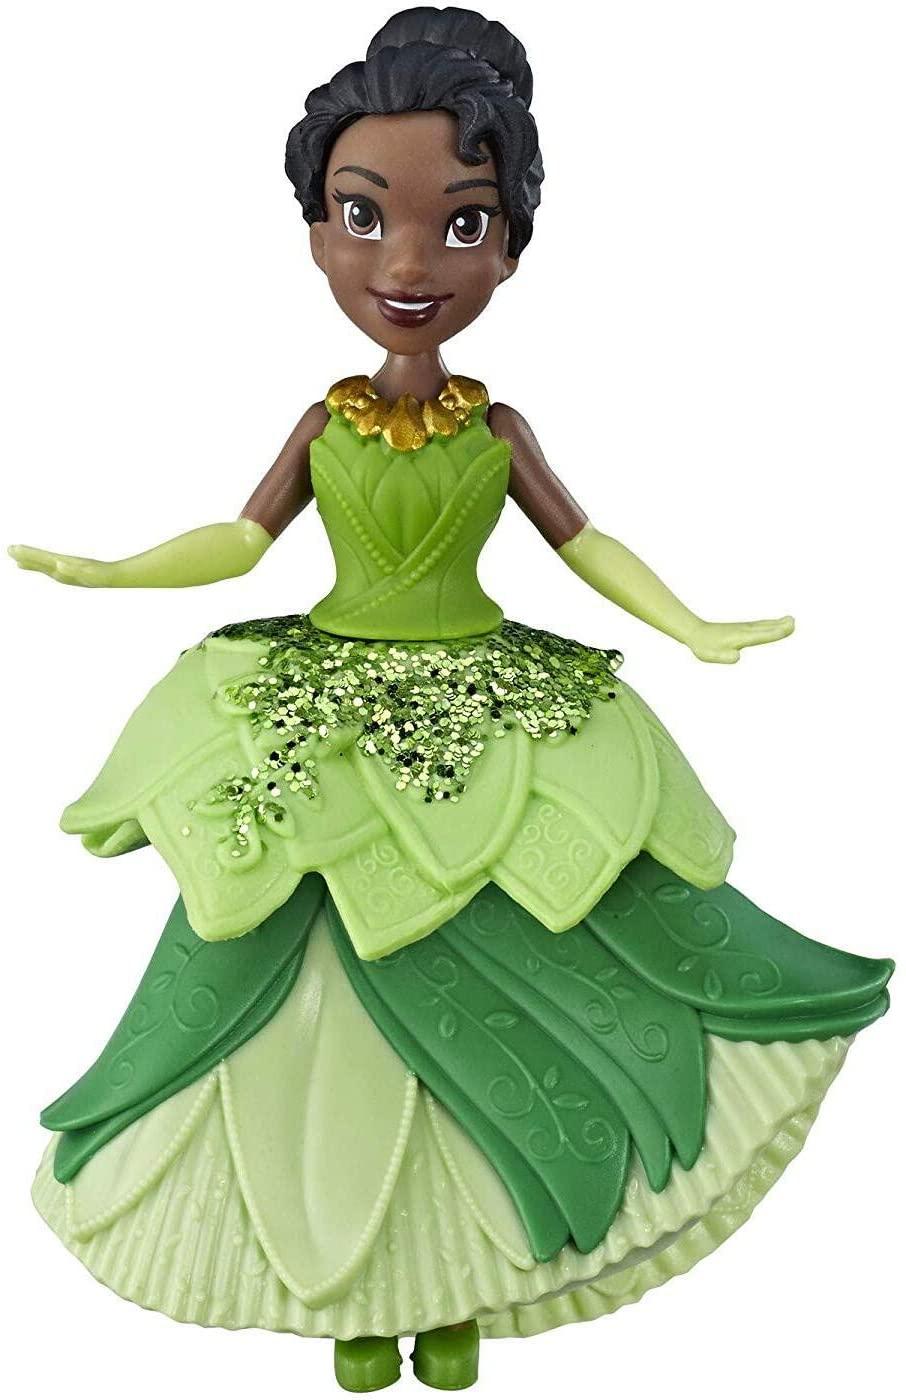 Boneca Mini Princesa Tiana - Royal Clips - Hasbro E3049